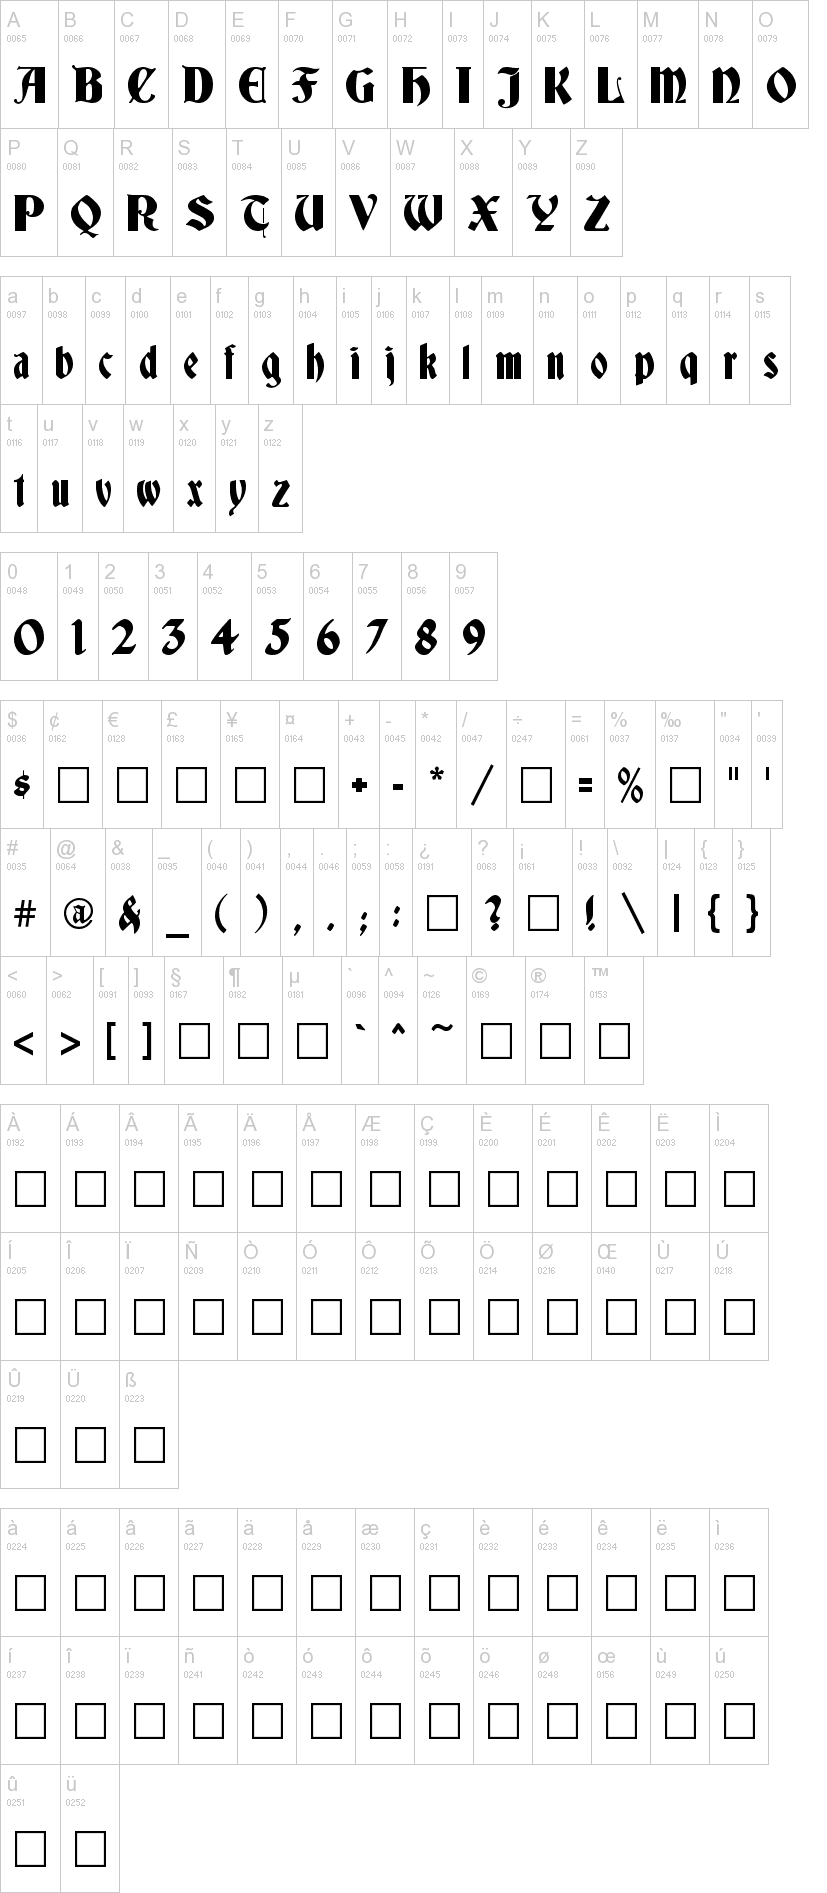 Deutsch Gothic Font | dafont.com